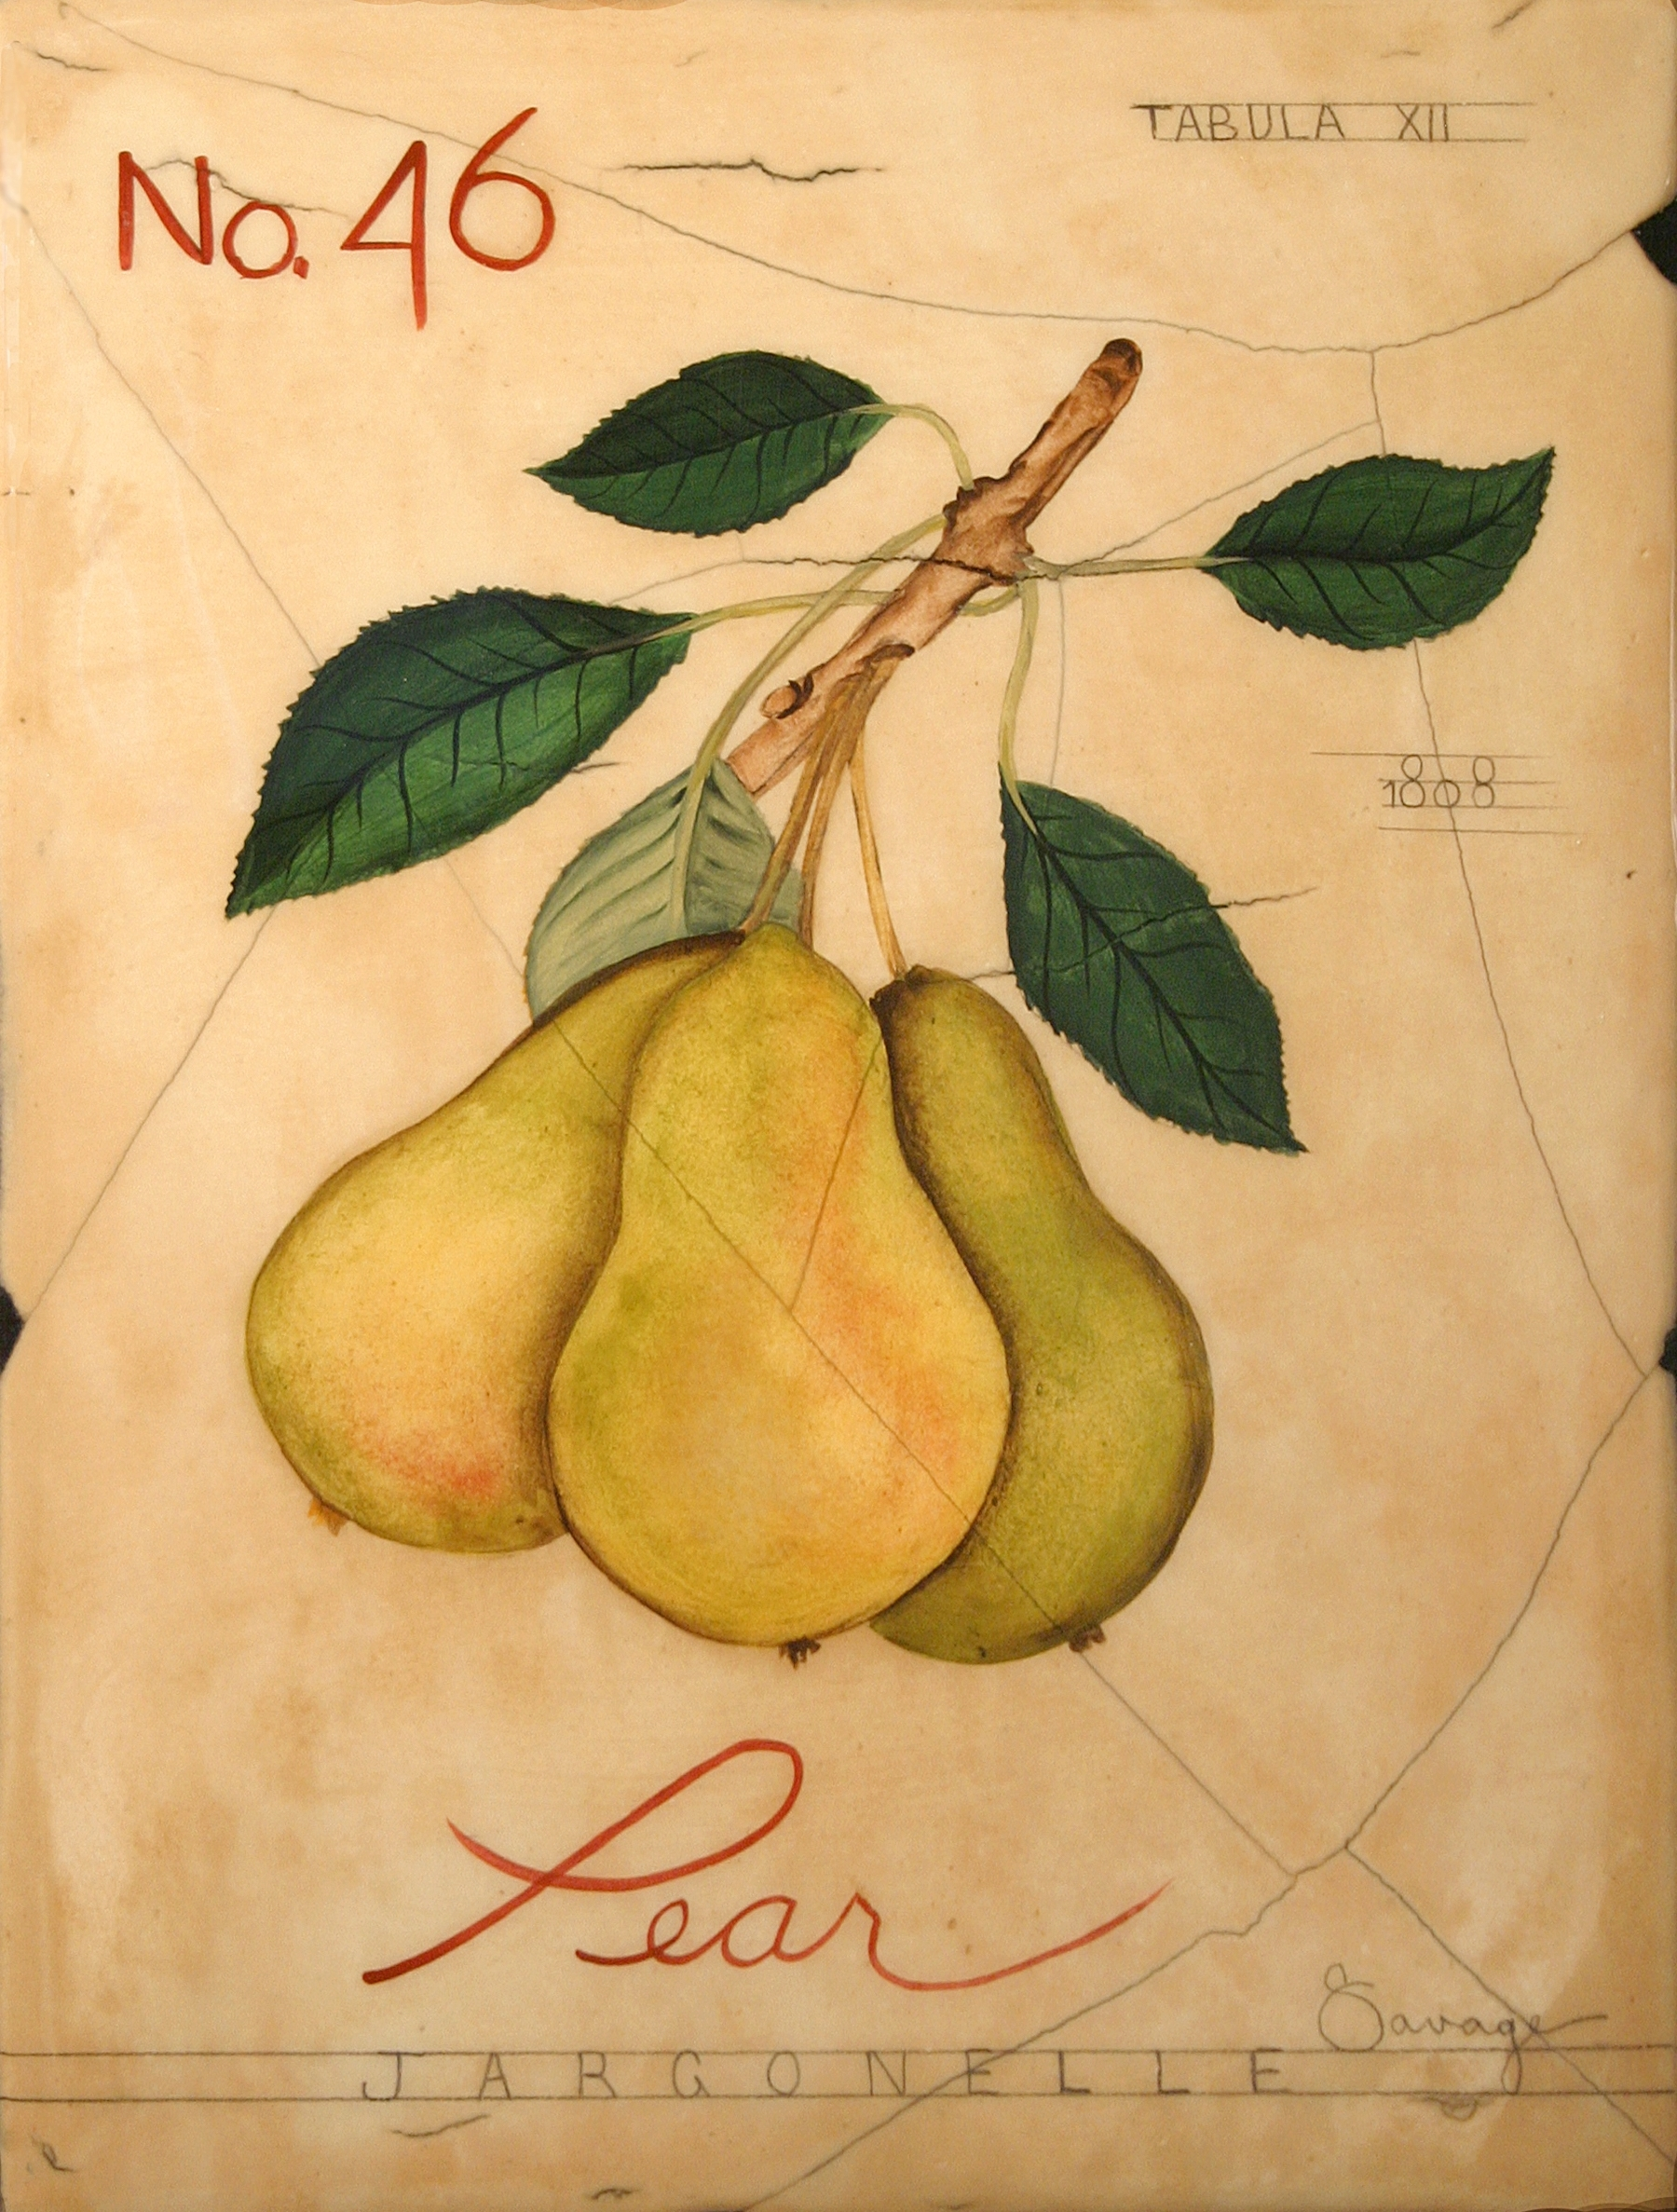 No. 46 Pear